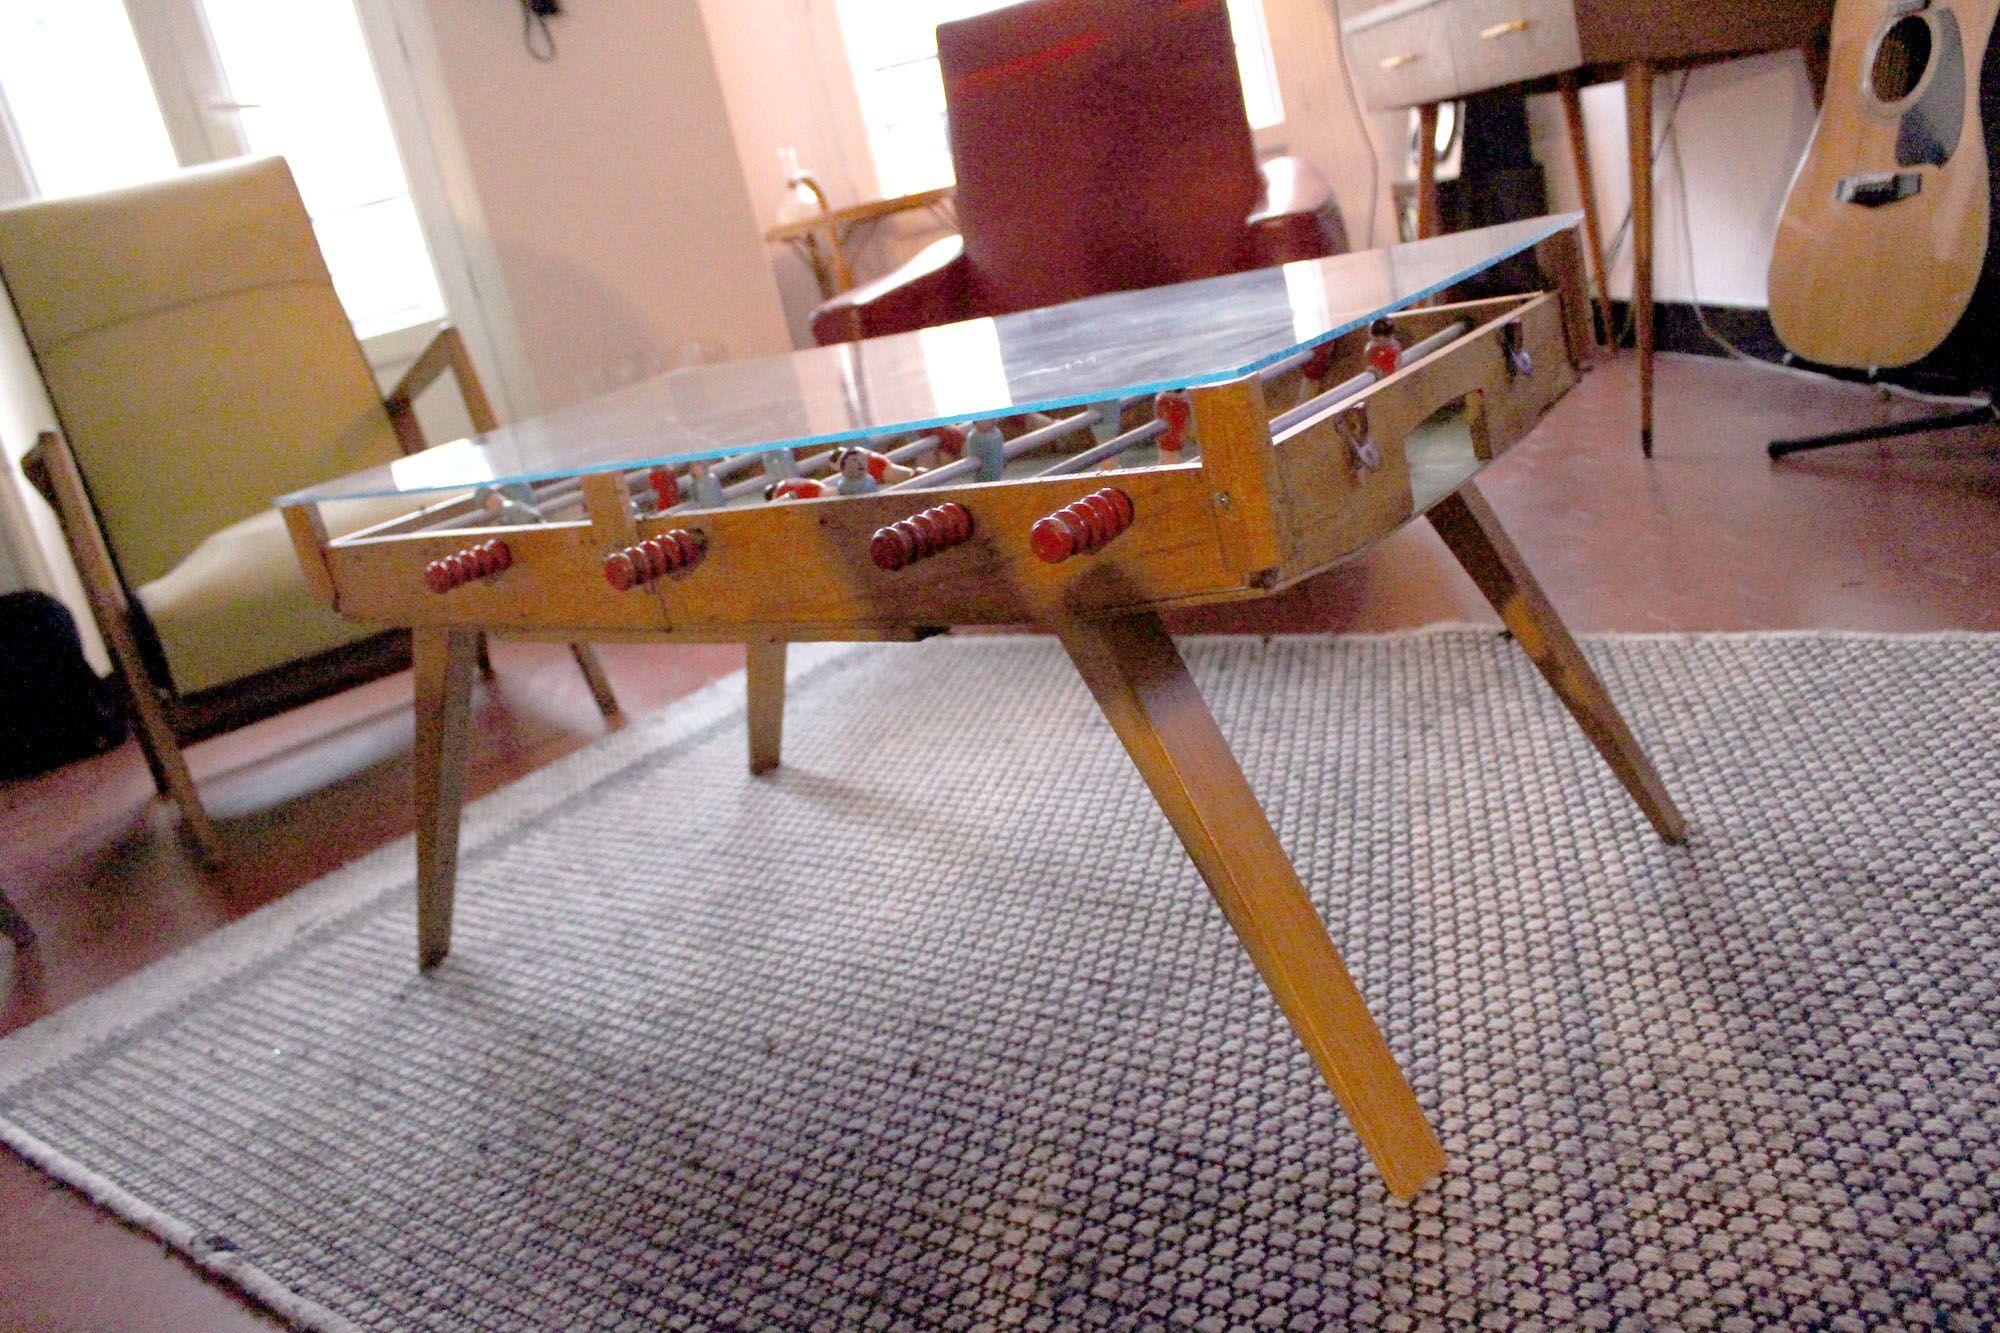 Baby Foot De Salon babyfoot ancien transformé en table basse | table basse